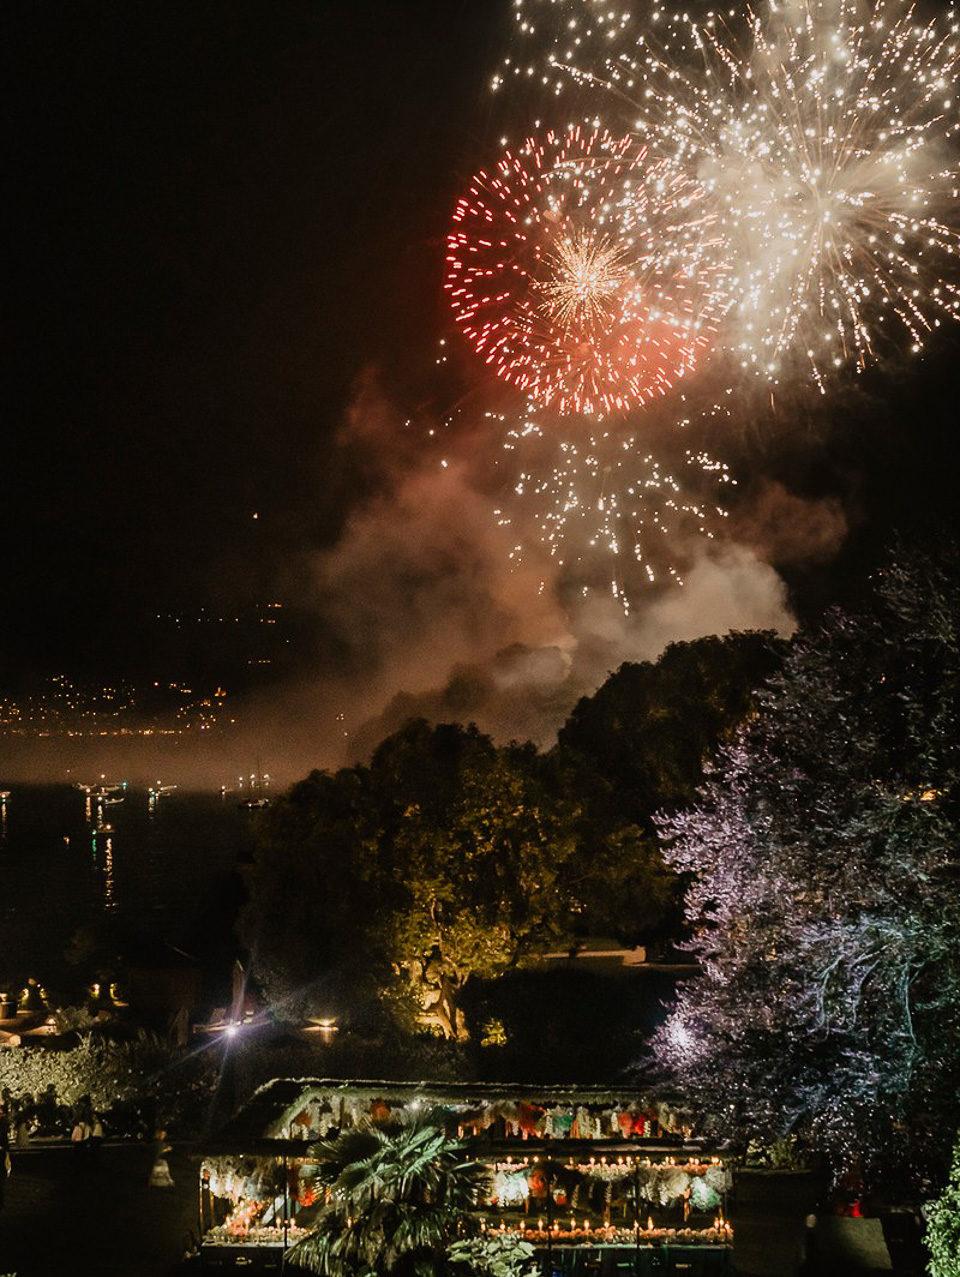 Villa Balbiano luxury property Lake Como Milan exclusive rental destination wedding firework park garden swimming pool 2 e1569862023542